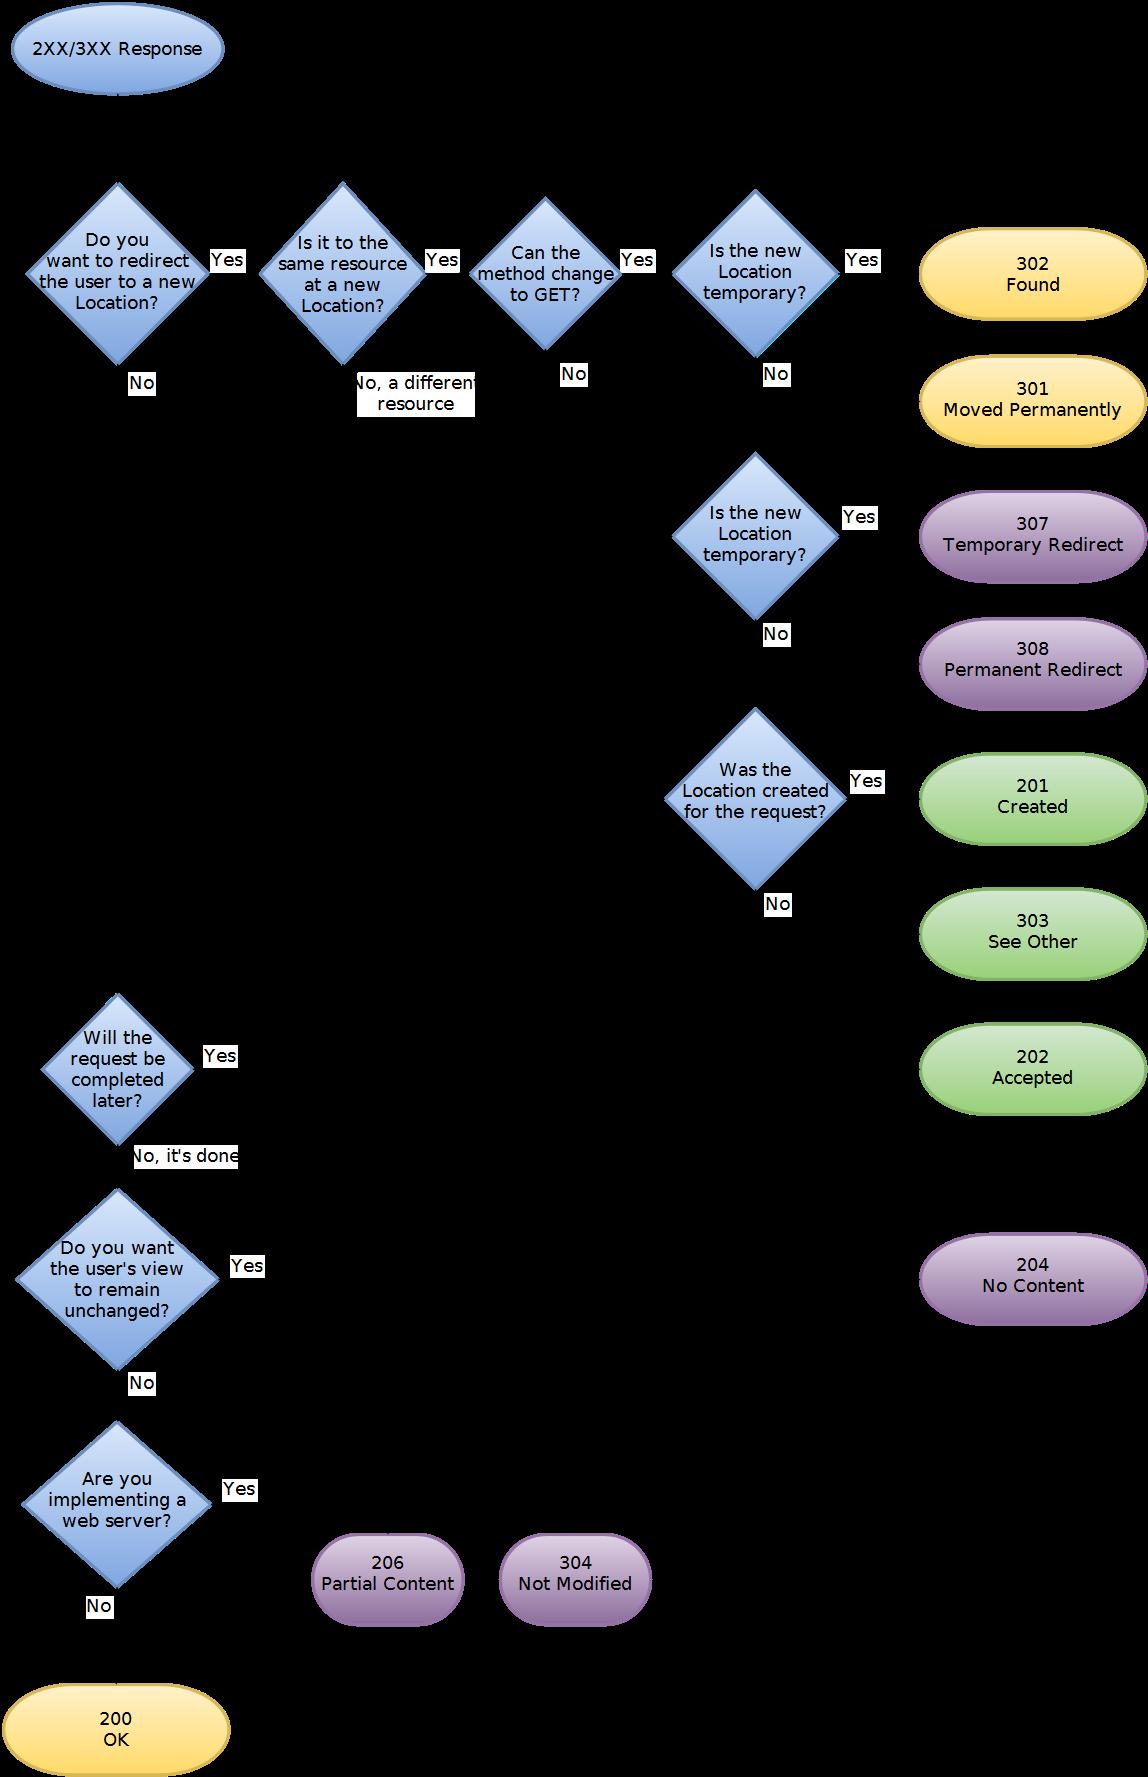 HTTP-2XX-3XX-Status-Codes